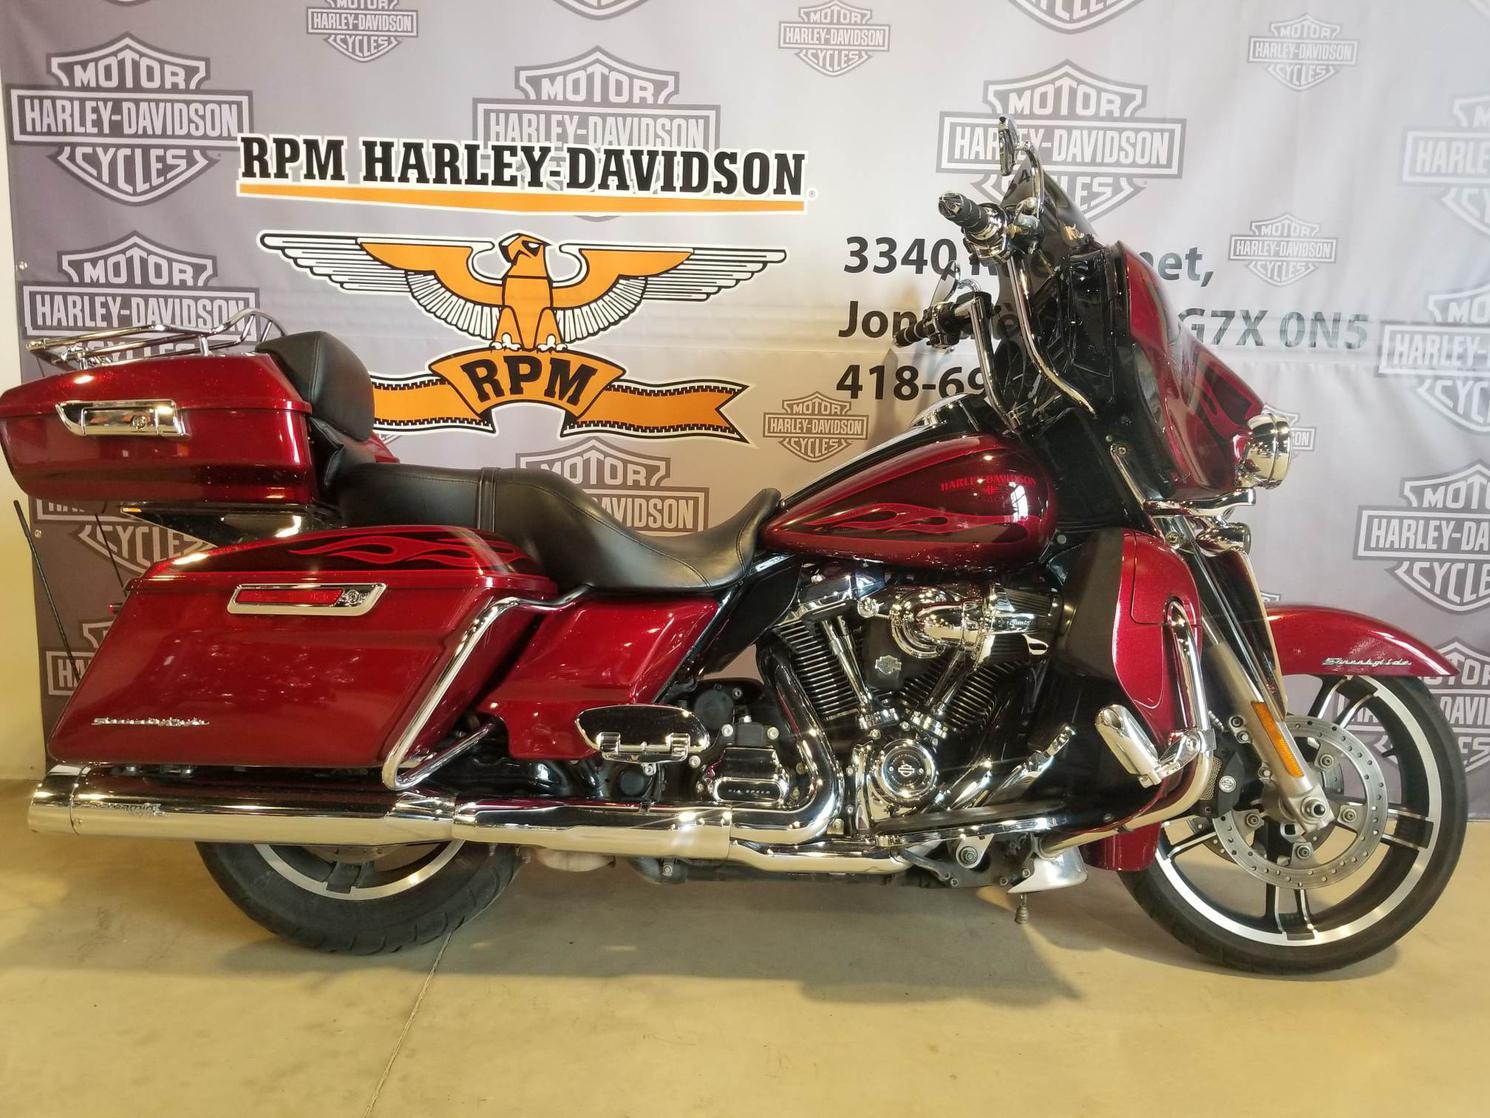 HB645953 Harley-Davidson Street Glide Special 2017